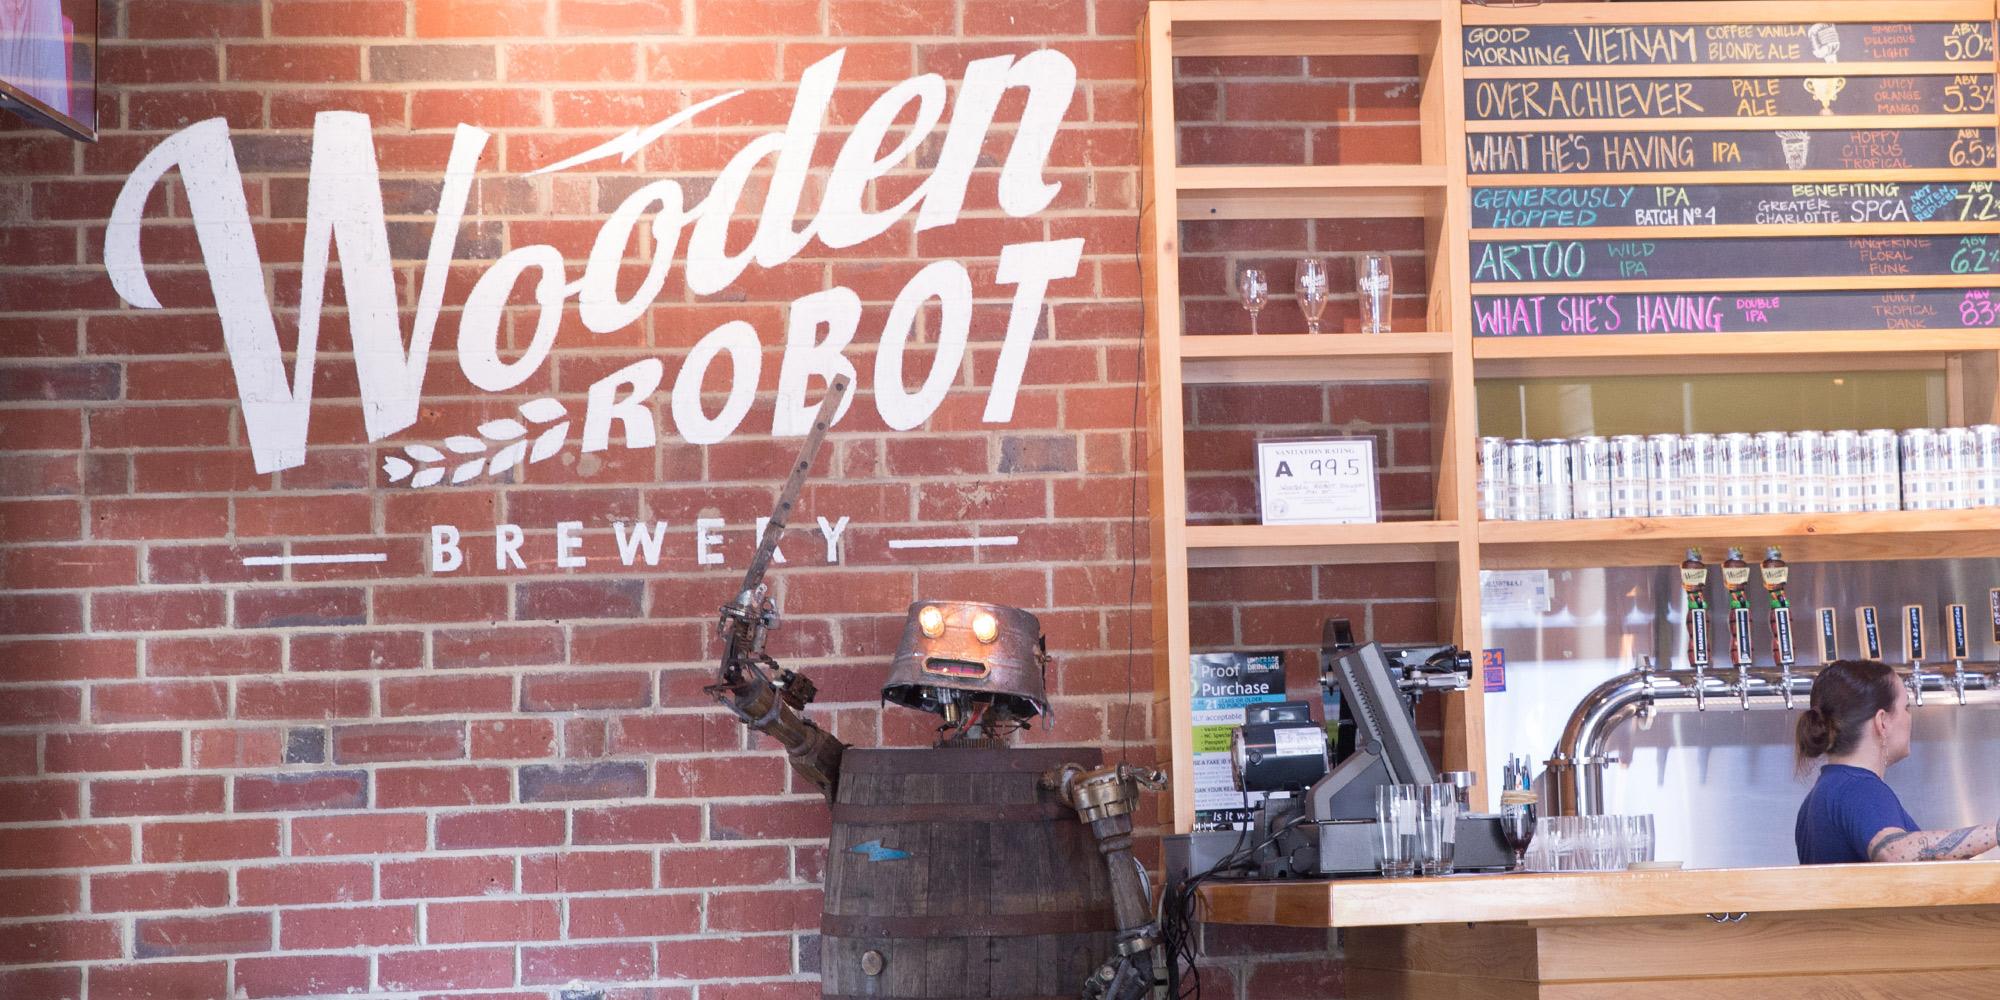 Wooden Robot Interior Signage